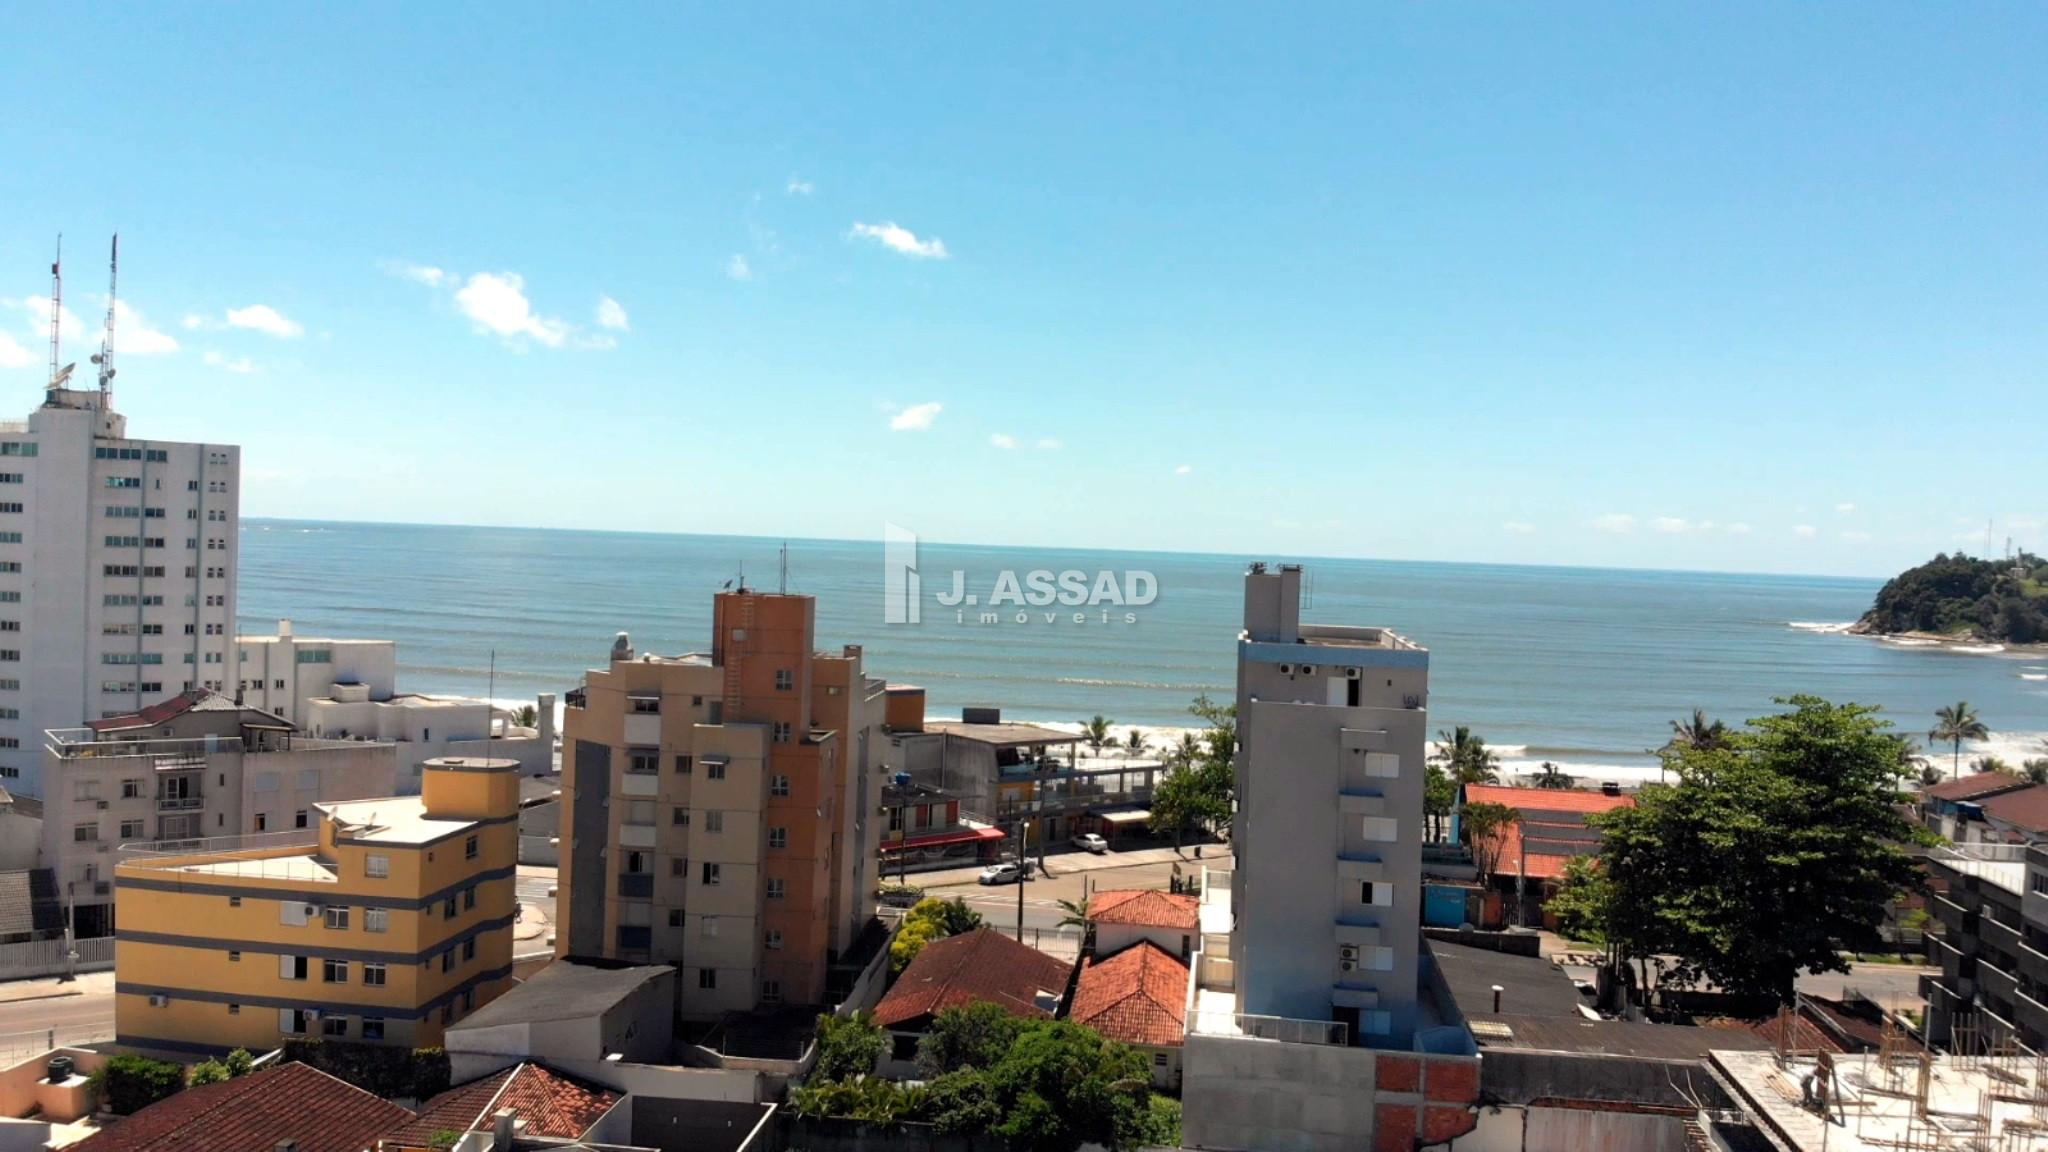 https://s3-sa-east-1.amazonaws.com/static-arbo/PH0007_JASSA/venda-cobertura-duplex-guaratuba-pr-brasil1608592505158durkz.jpg